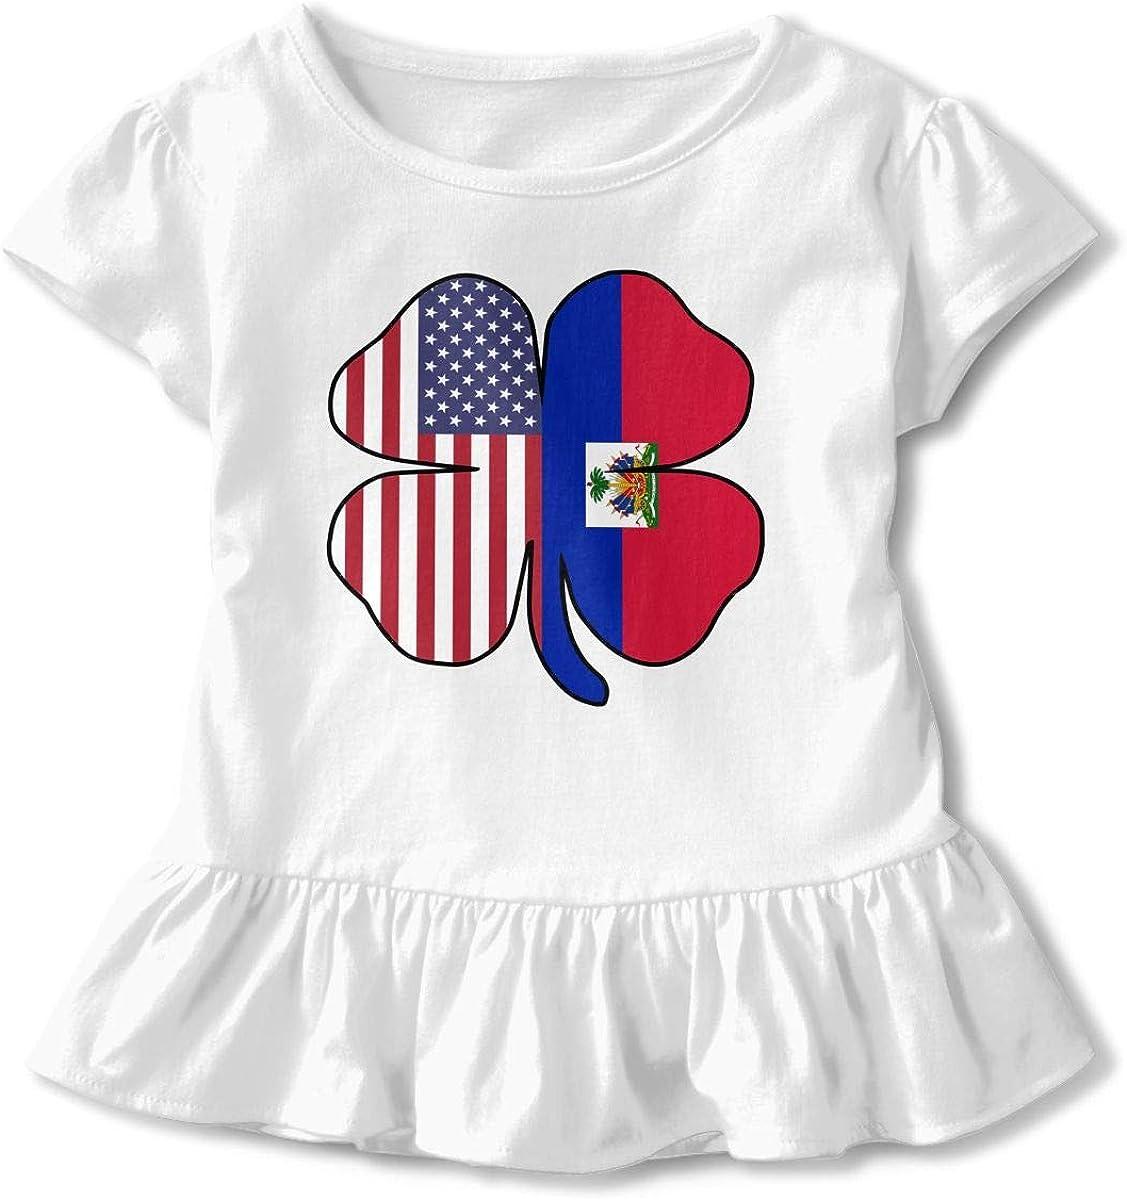 HYBDX9T Little Girls American Haitian Flag Shamrock Funny Short Sleeve Cotton T Shirts Basic Tops Tee Clothes